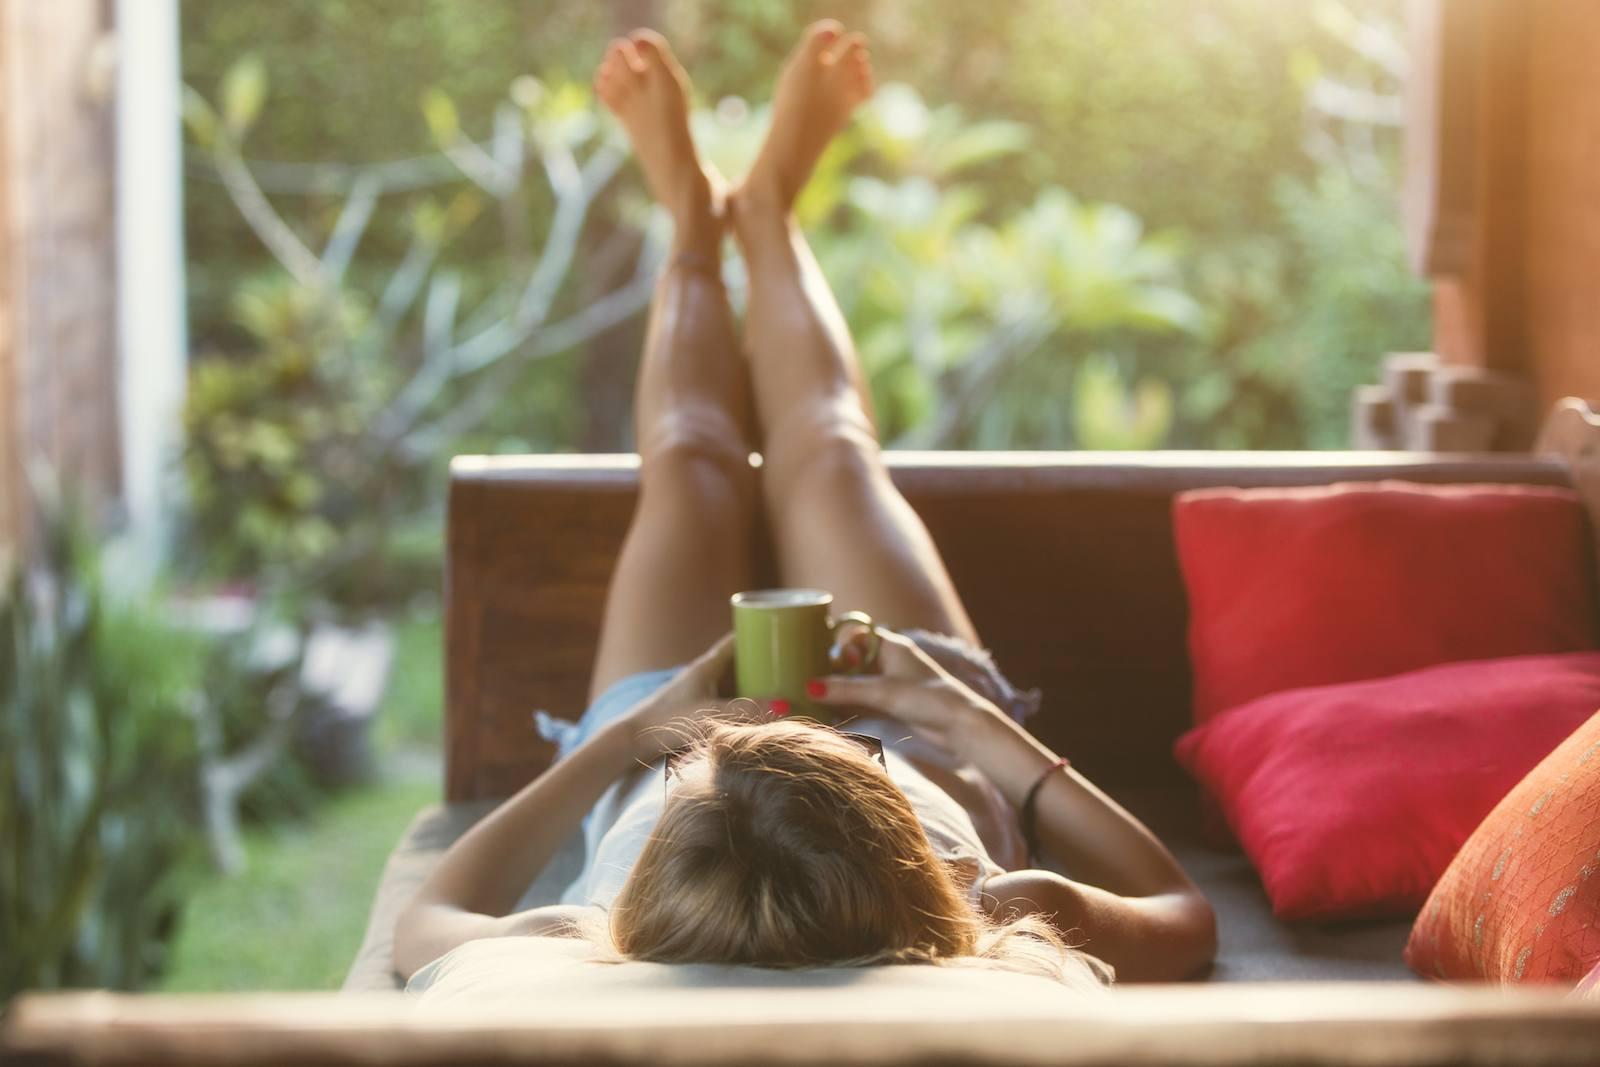 Best Kratom for Pain: Reward Your Body Through These Strains